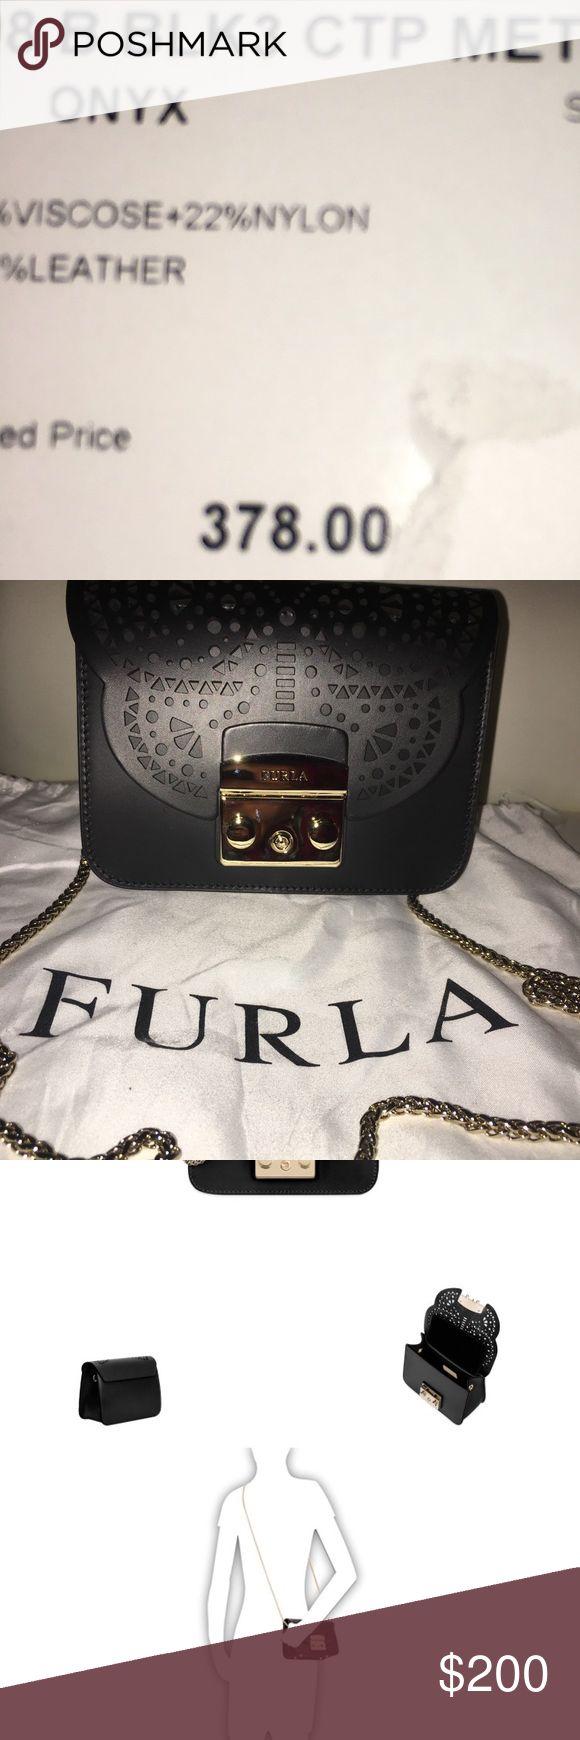 FURLA METROPOLIS  CROSSBODY ONYX Original price $378  Sale price $190 Furla Bags